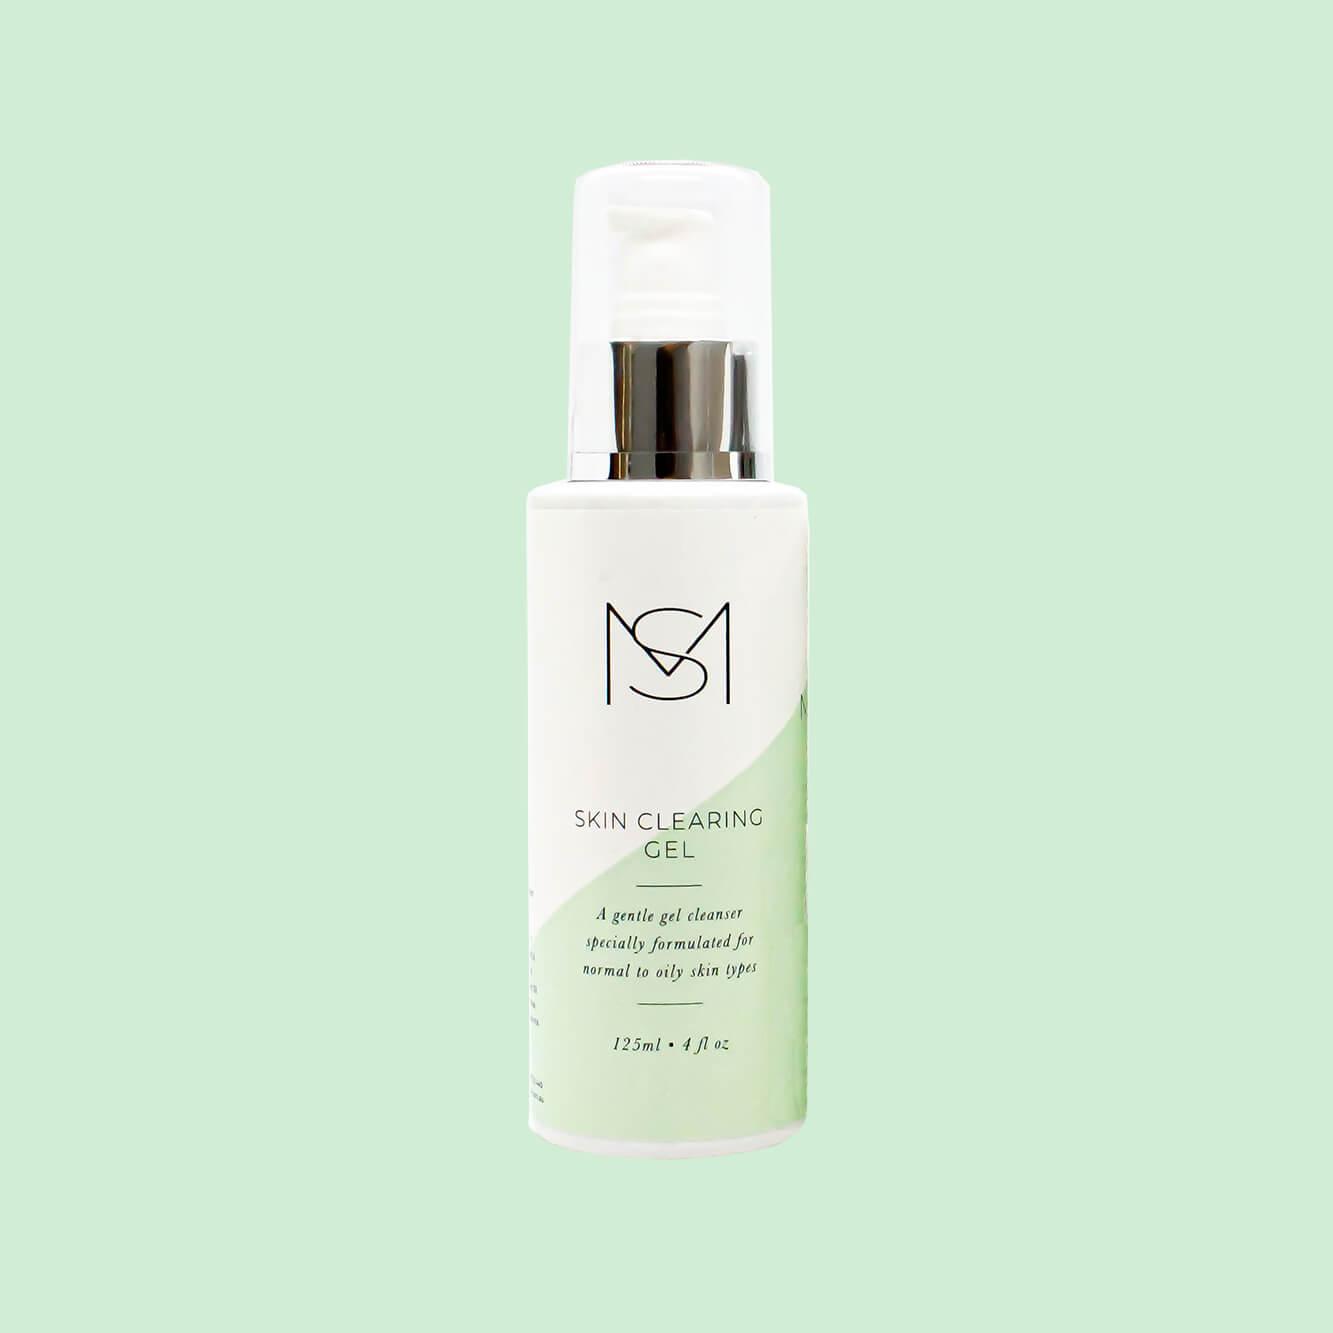 Skin Clearing Gel 125mL - Australian made skincare by Mariella Skin Perth WA